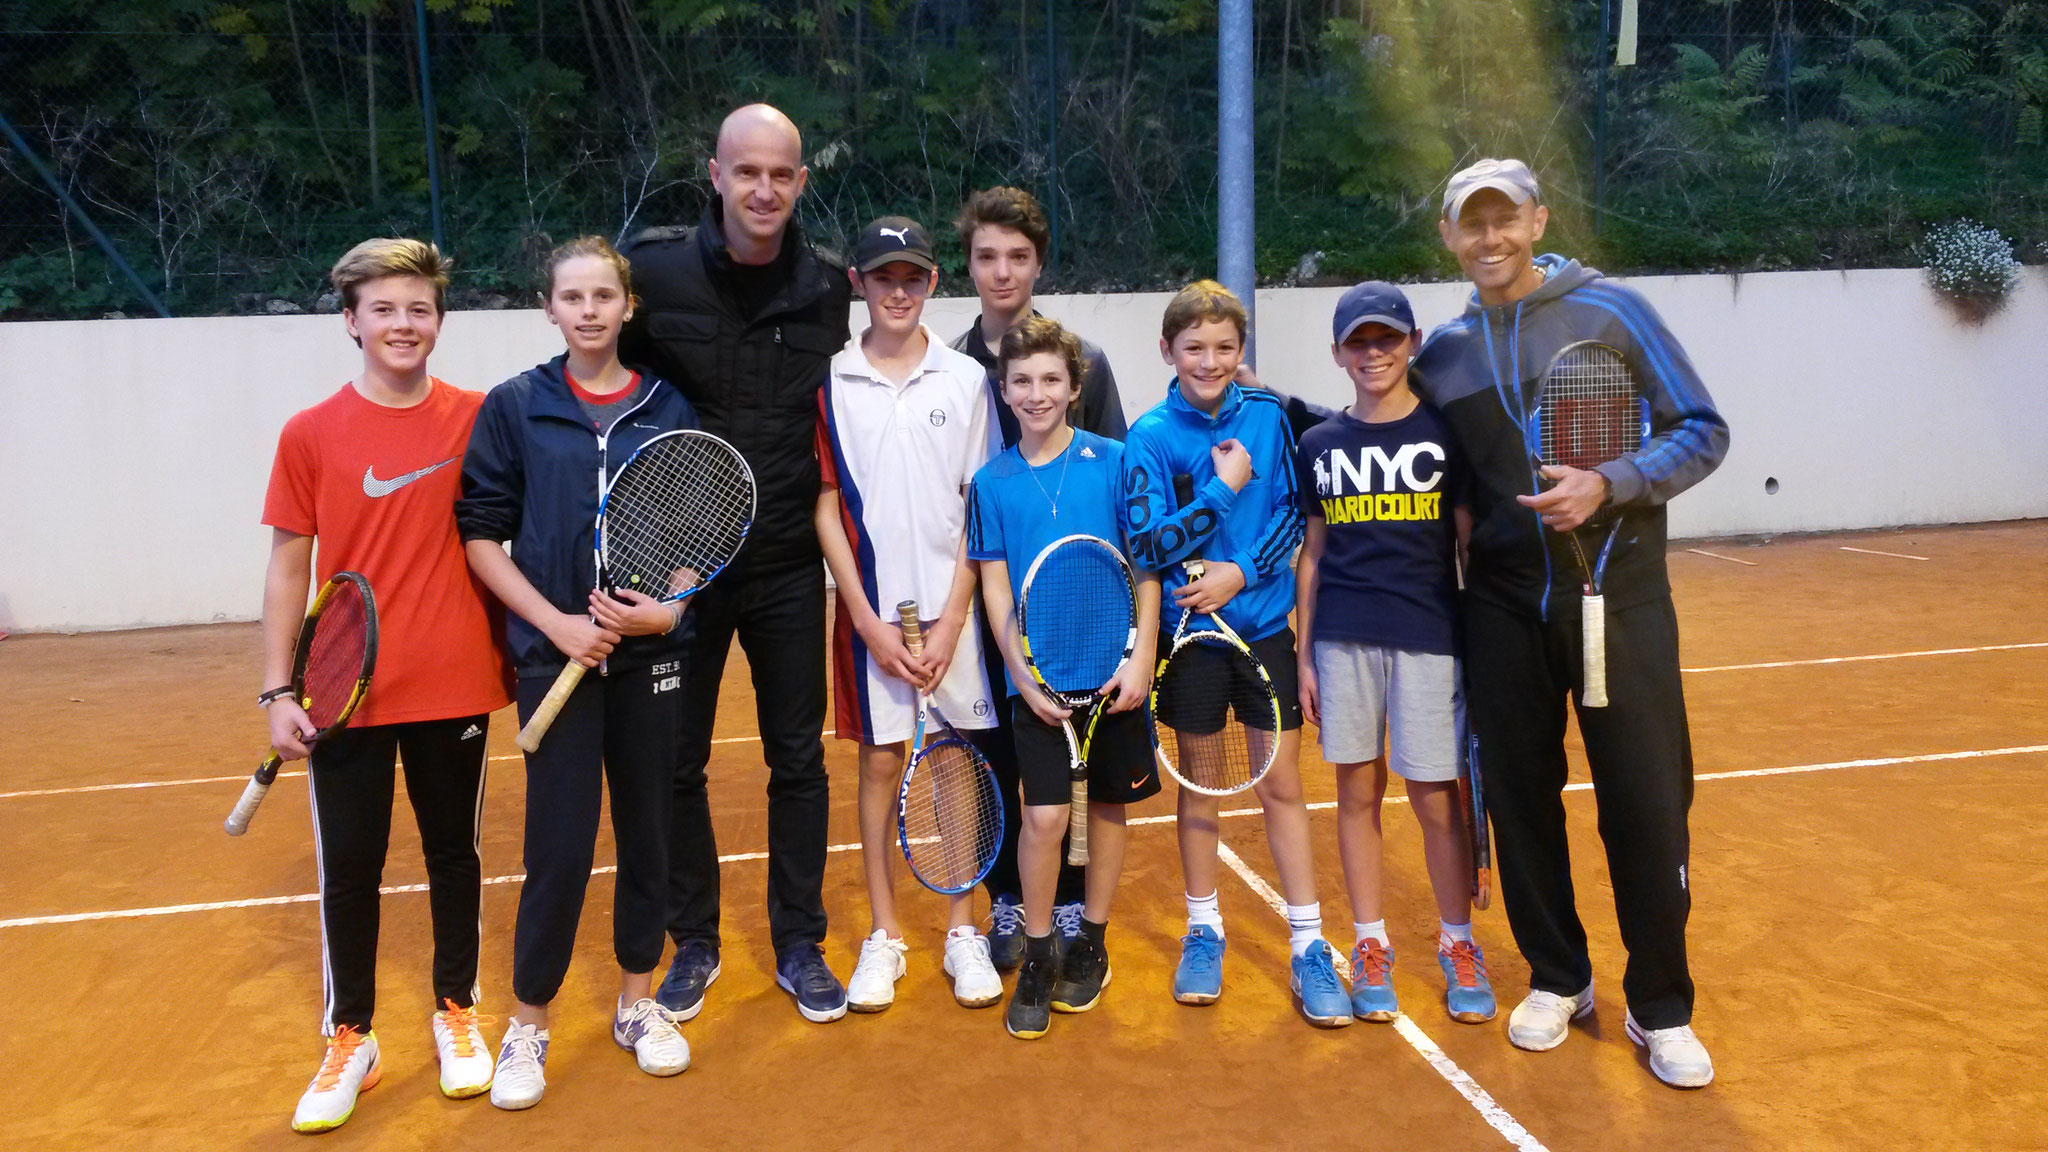 Visite d'Ivan Ljubicic au TC Monaco en Novembre 2016.